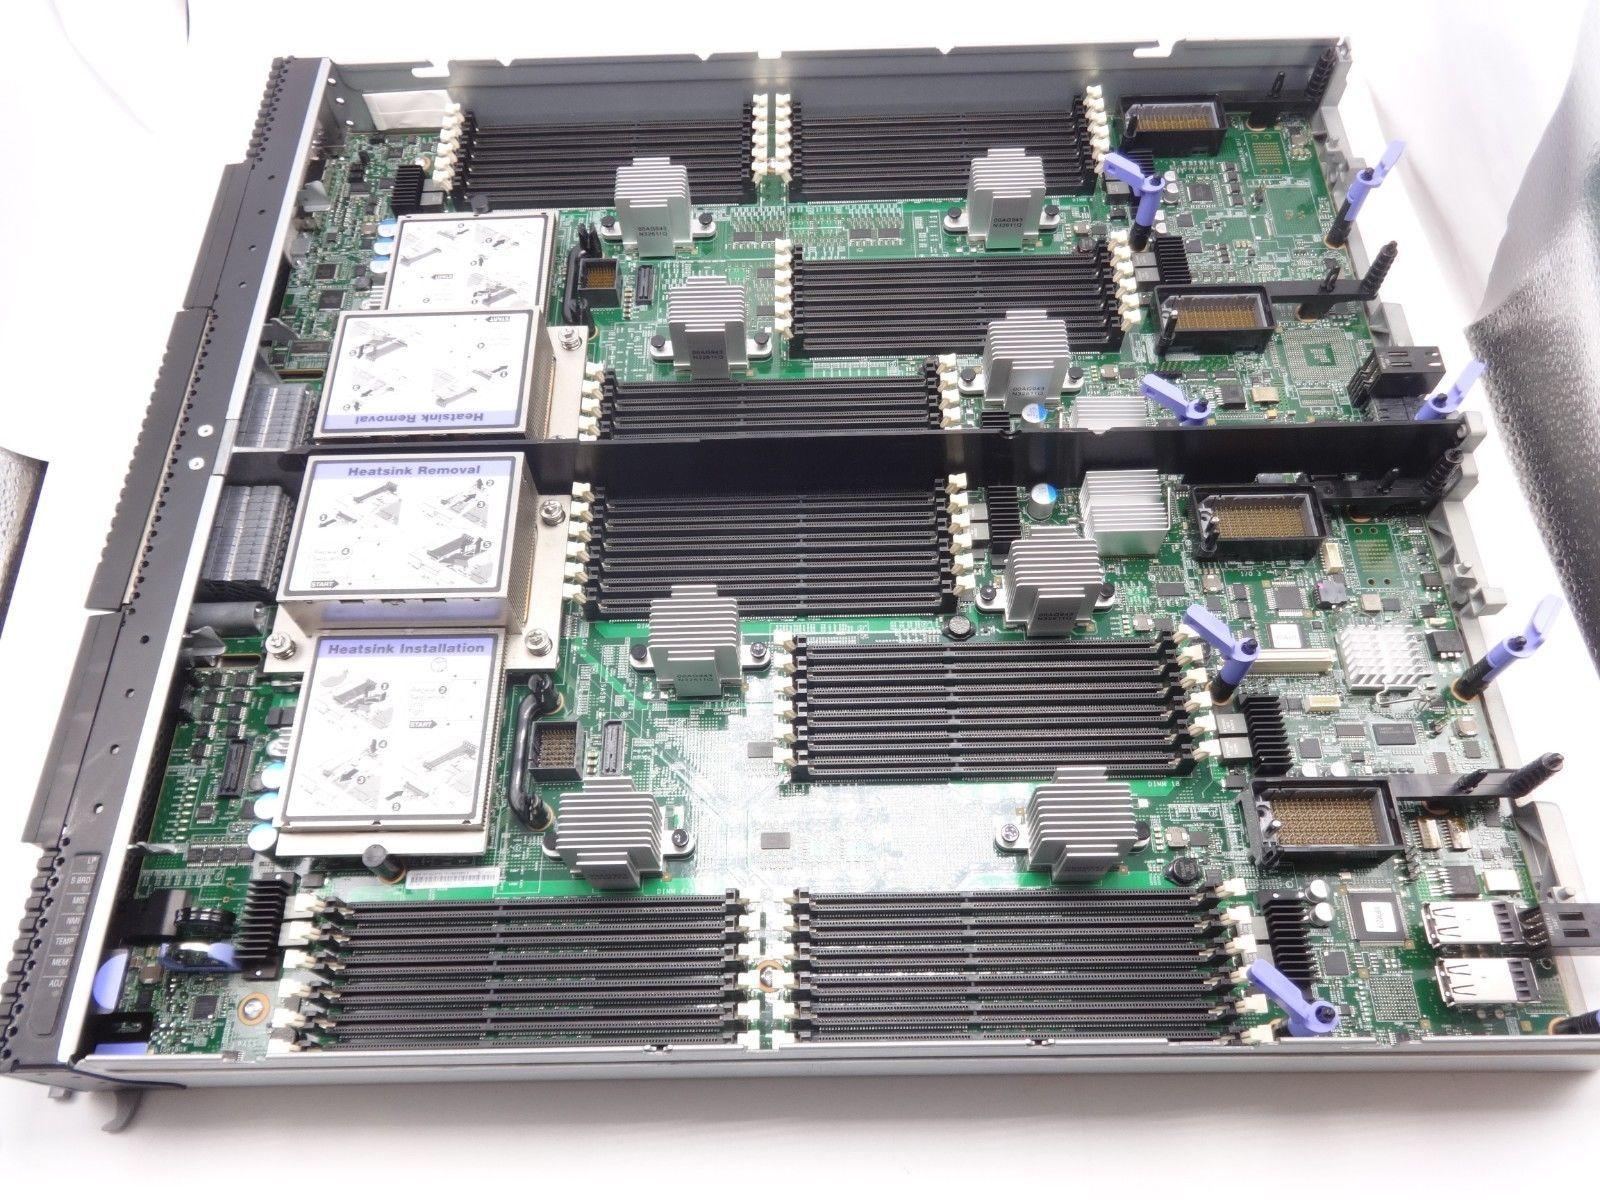 IBM MT-M 8188 WINDOWS 7 DRIVERS DOWNLOAD (2019)